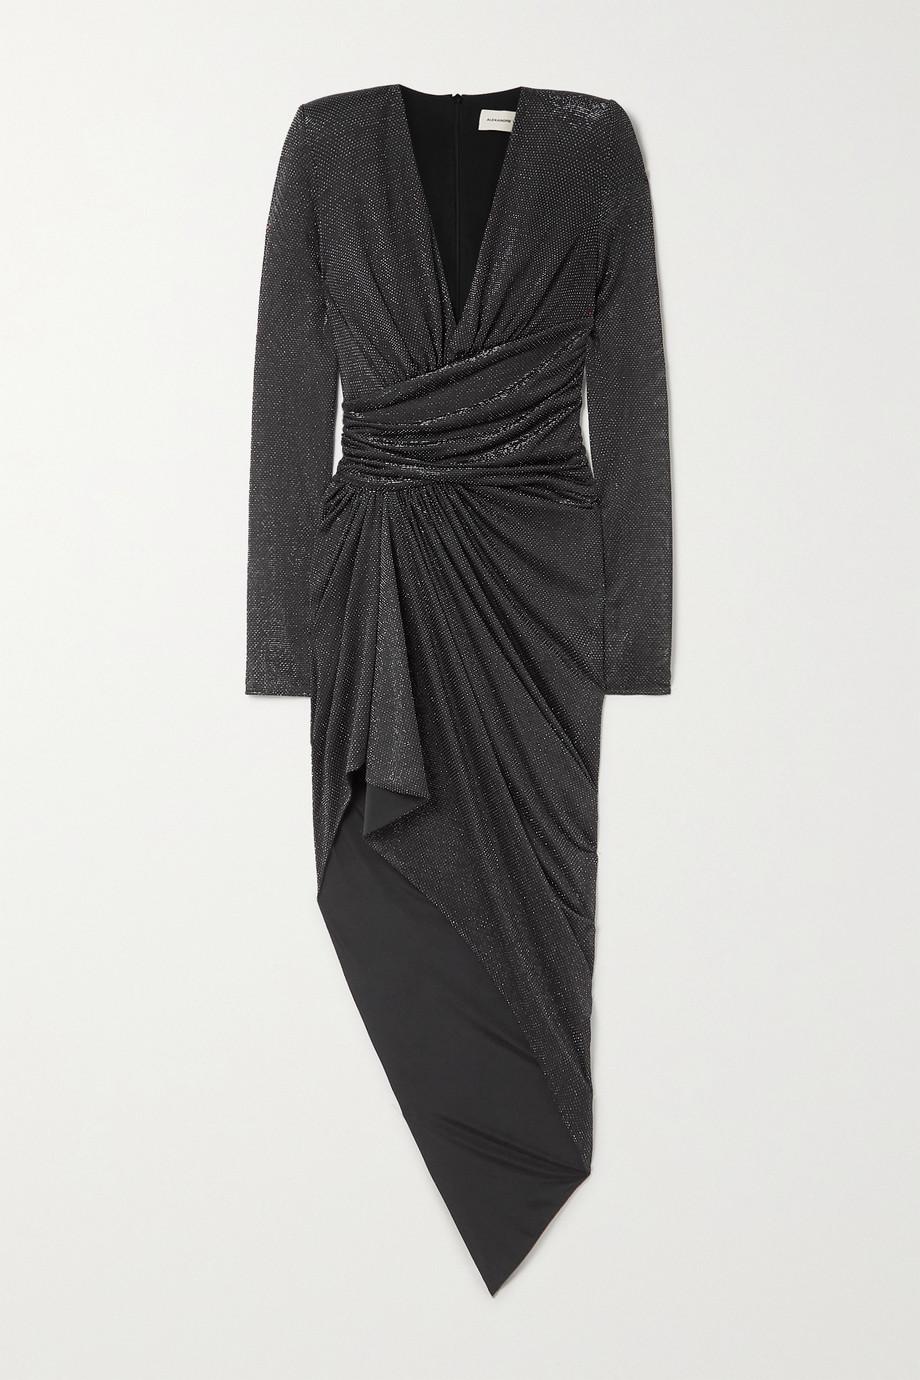 Alexandre Vauthier Asymmetric gathered stretch-Lurex dress